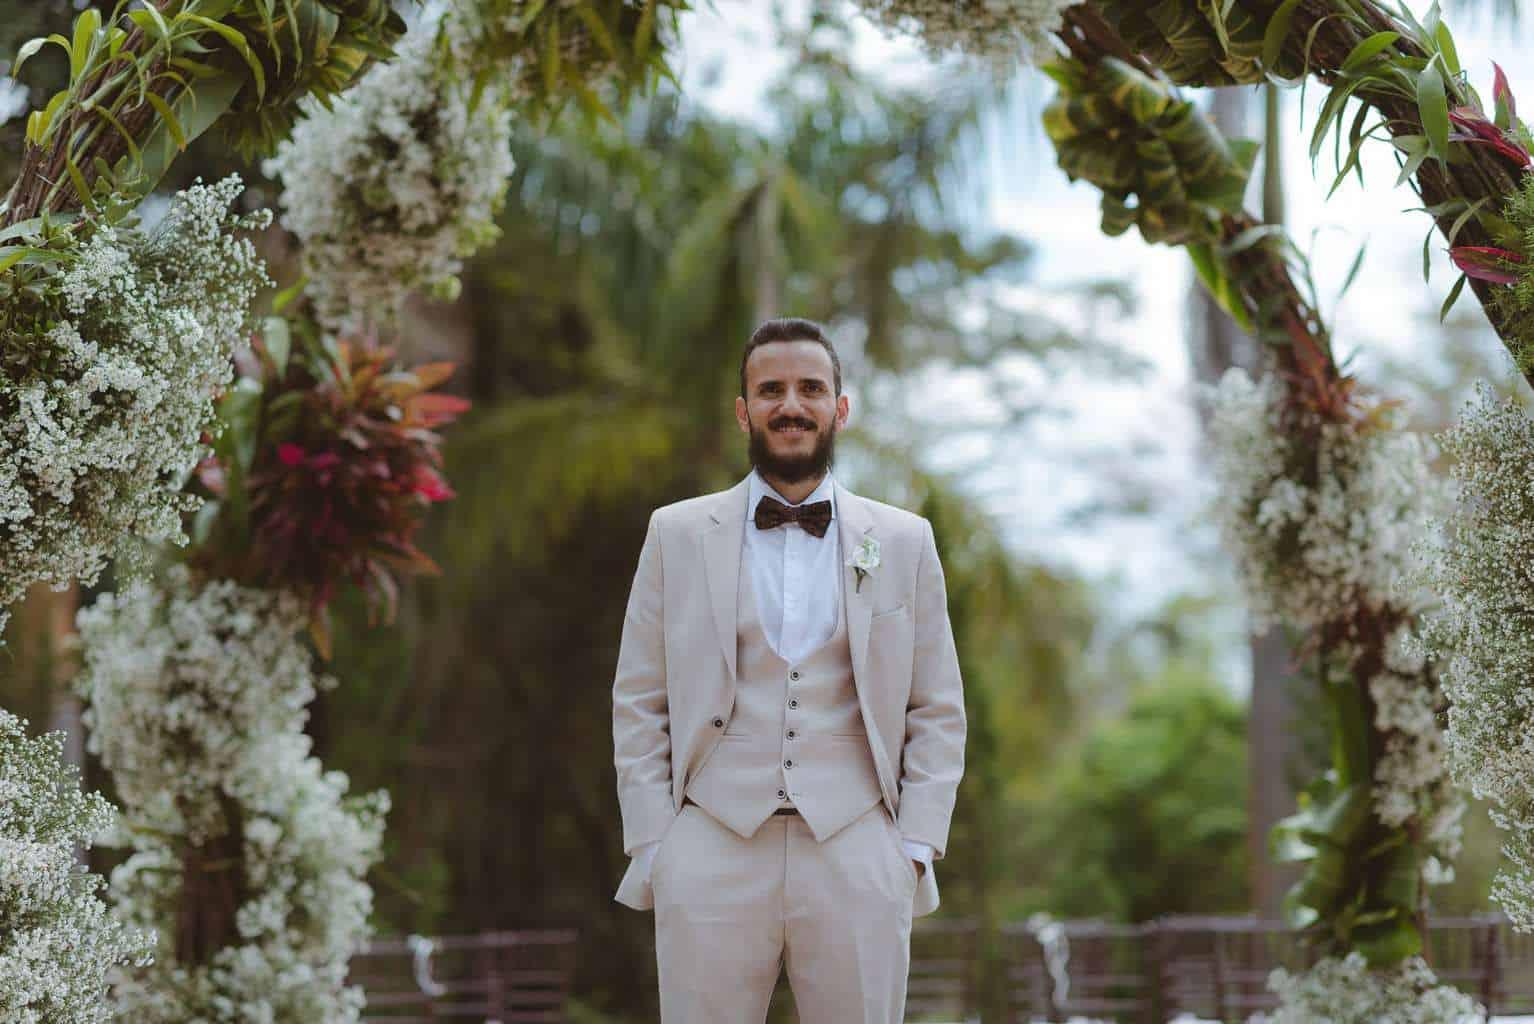 casamento-ao-ar-livre-casamento-boho-casamento-geek-casamento-rustico-casamento-Thais-e-Pedro-noivo-Revoar-Fotografia-Villa-Borghese-Eventos-40